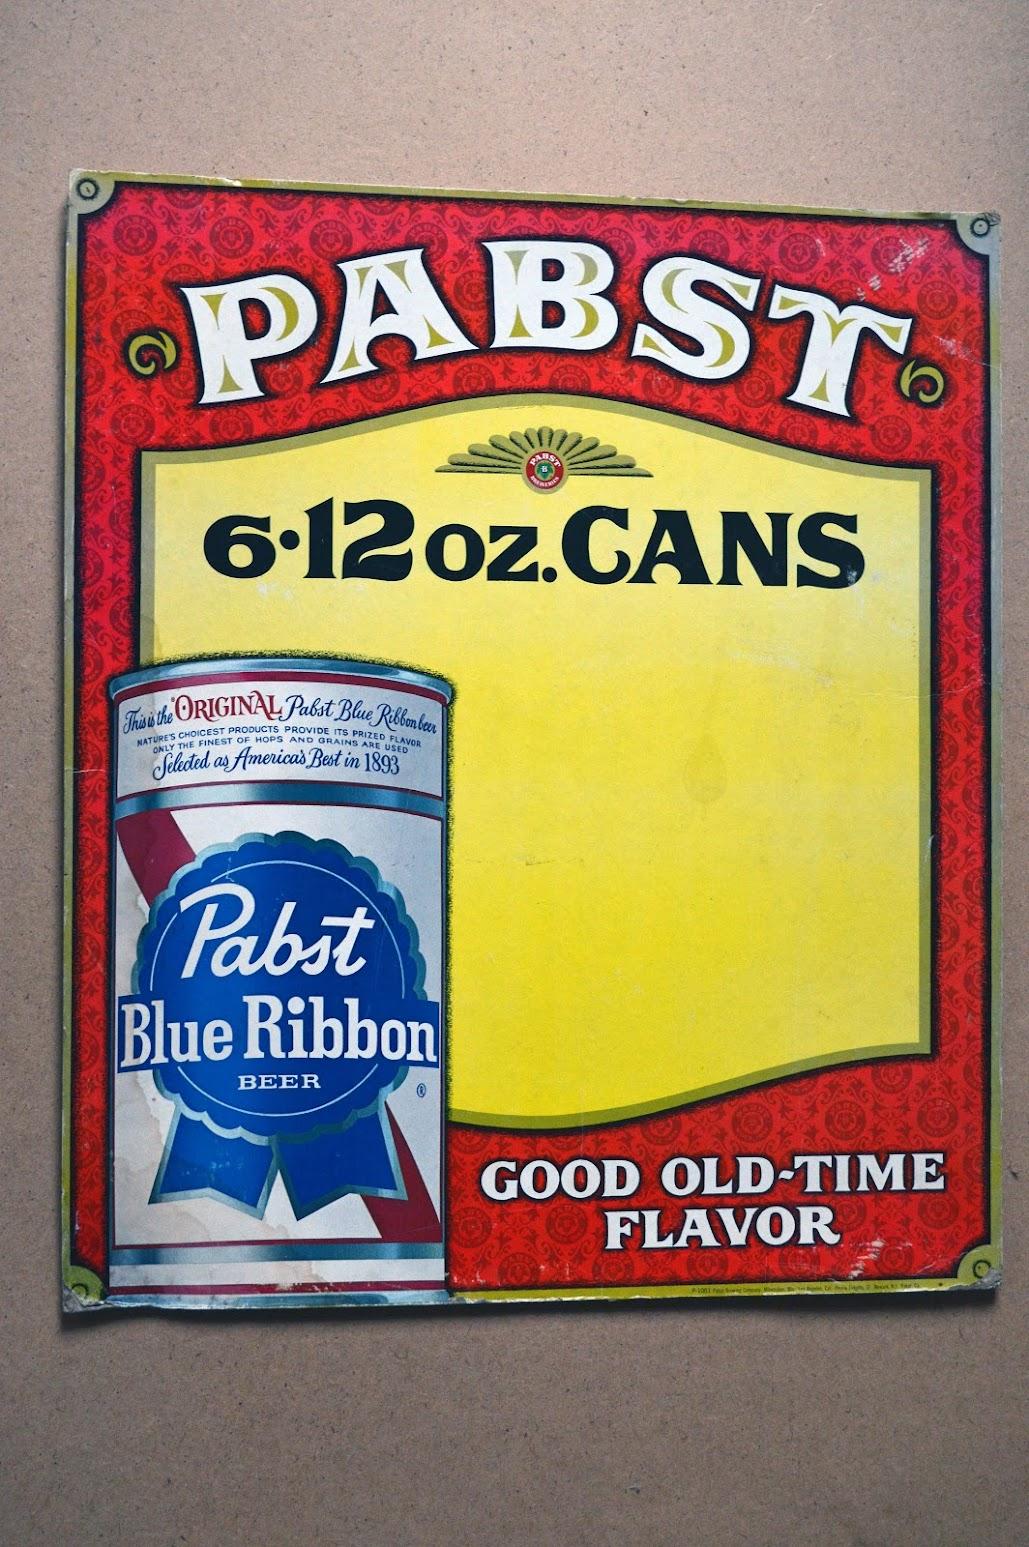 Pabst - Blue Ribbon Bier